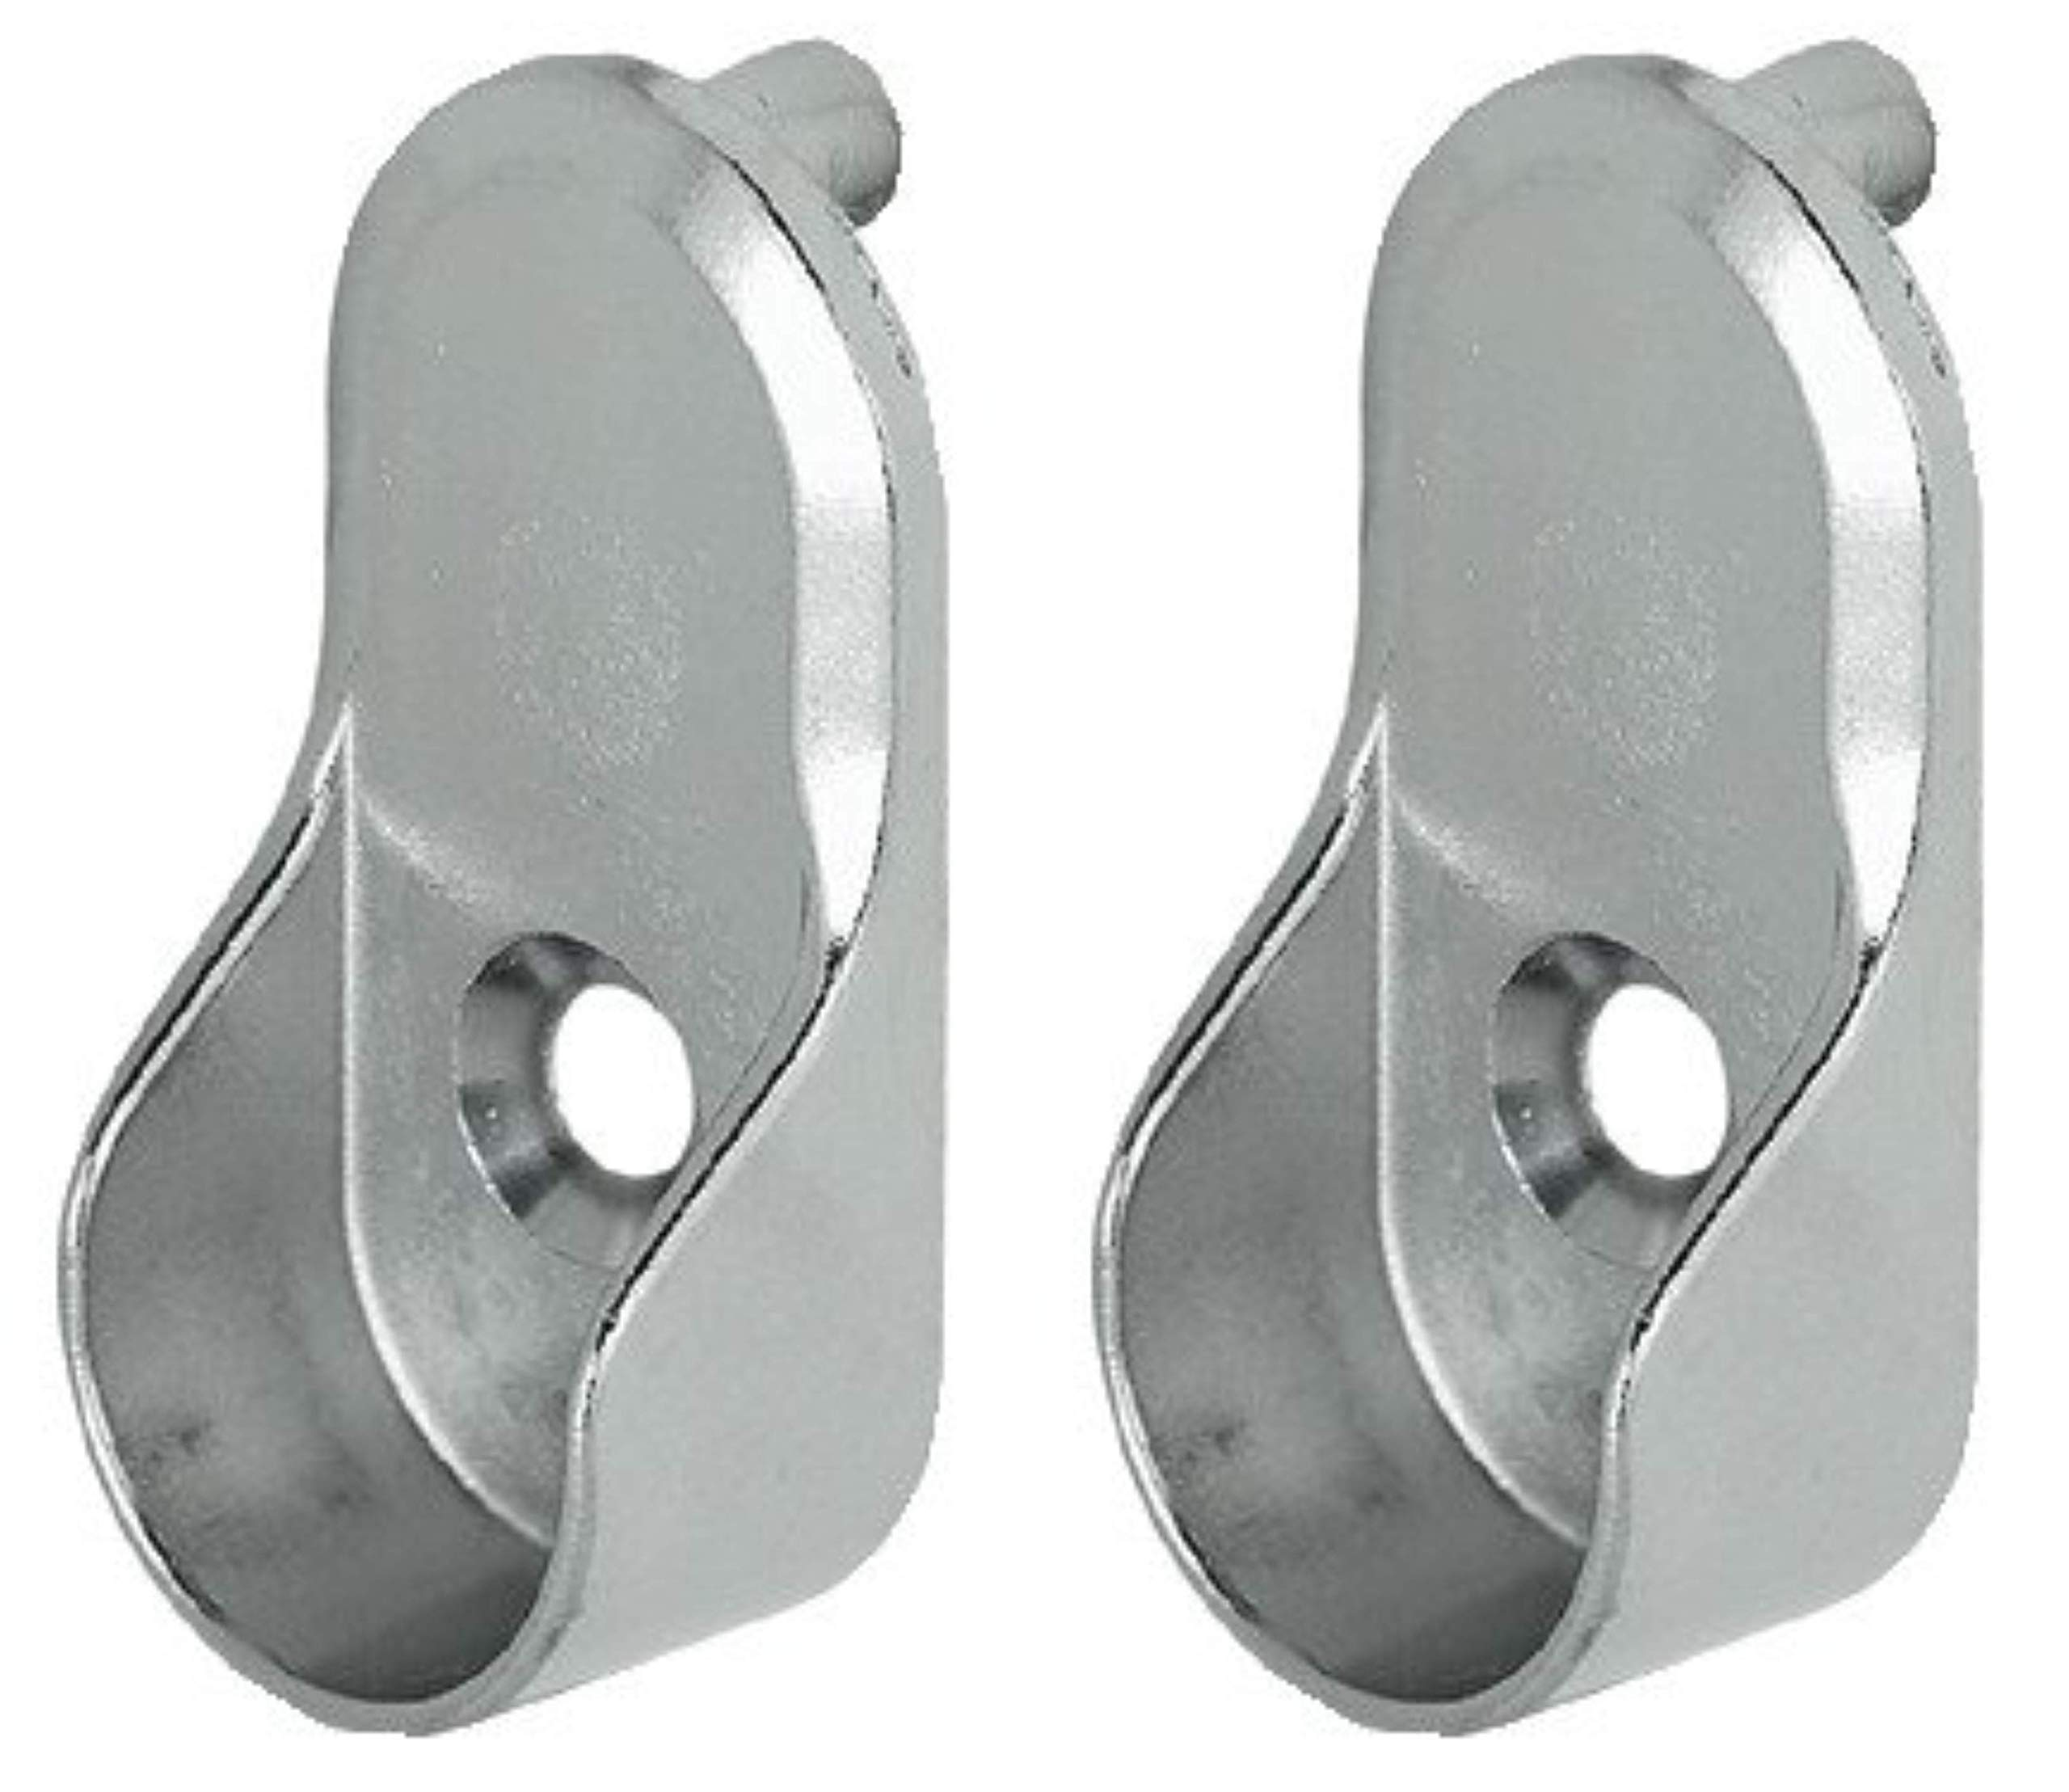 Fischer GKM FIXINGS Plaster Board Dowel /Ø 4-5 X 31MM FIXINGS Screws Included Box Size x100